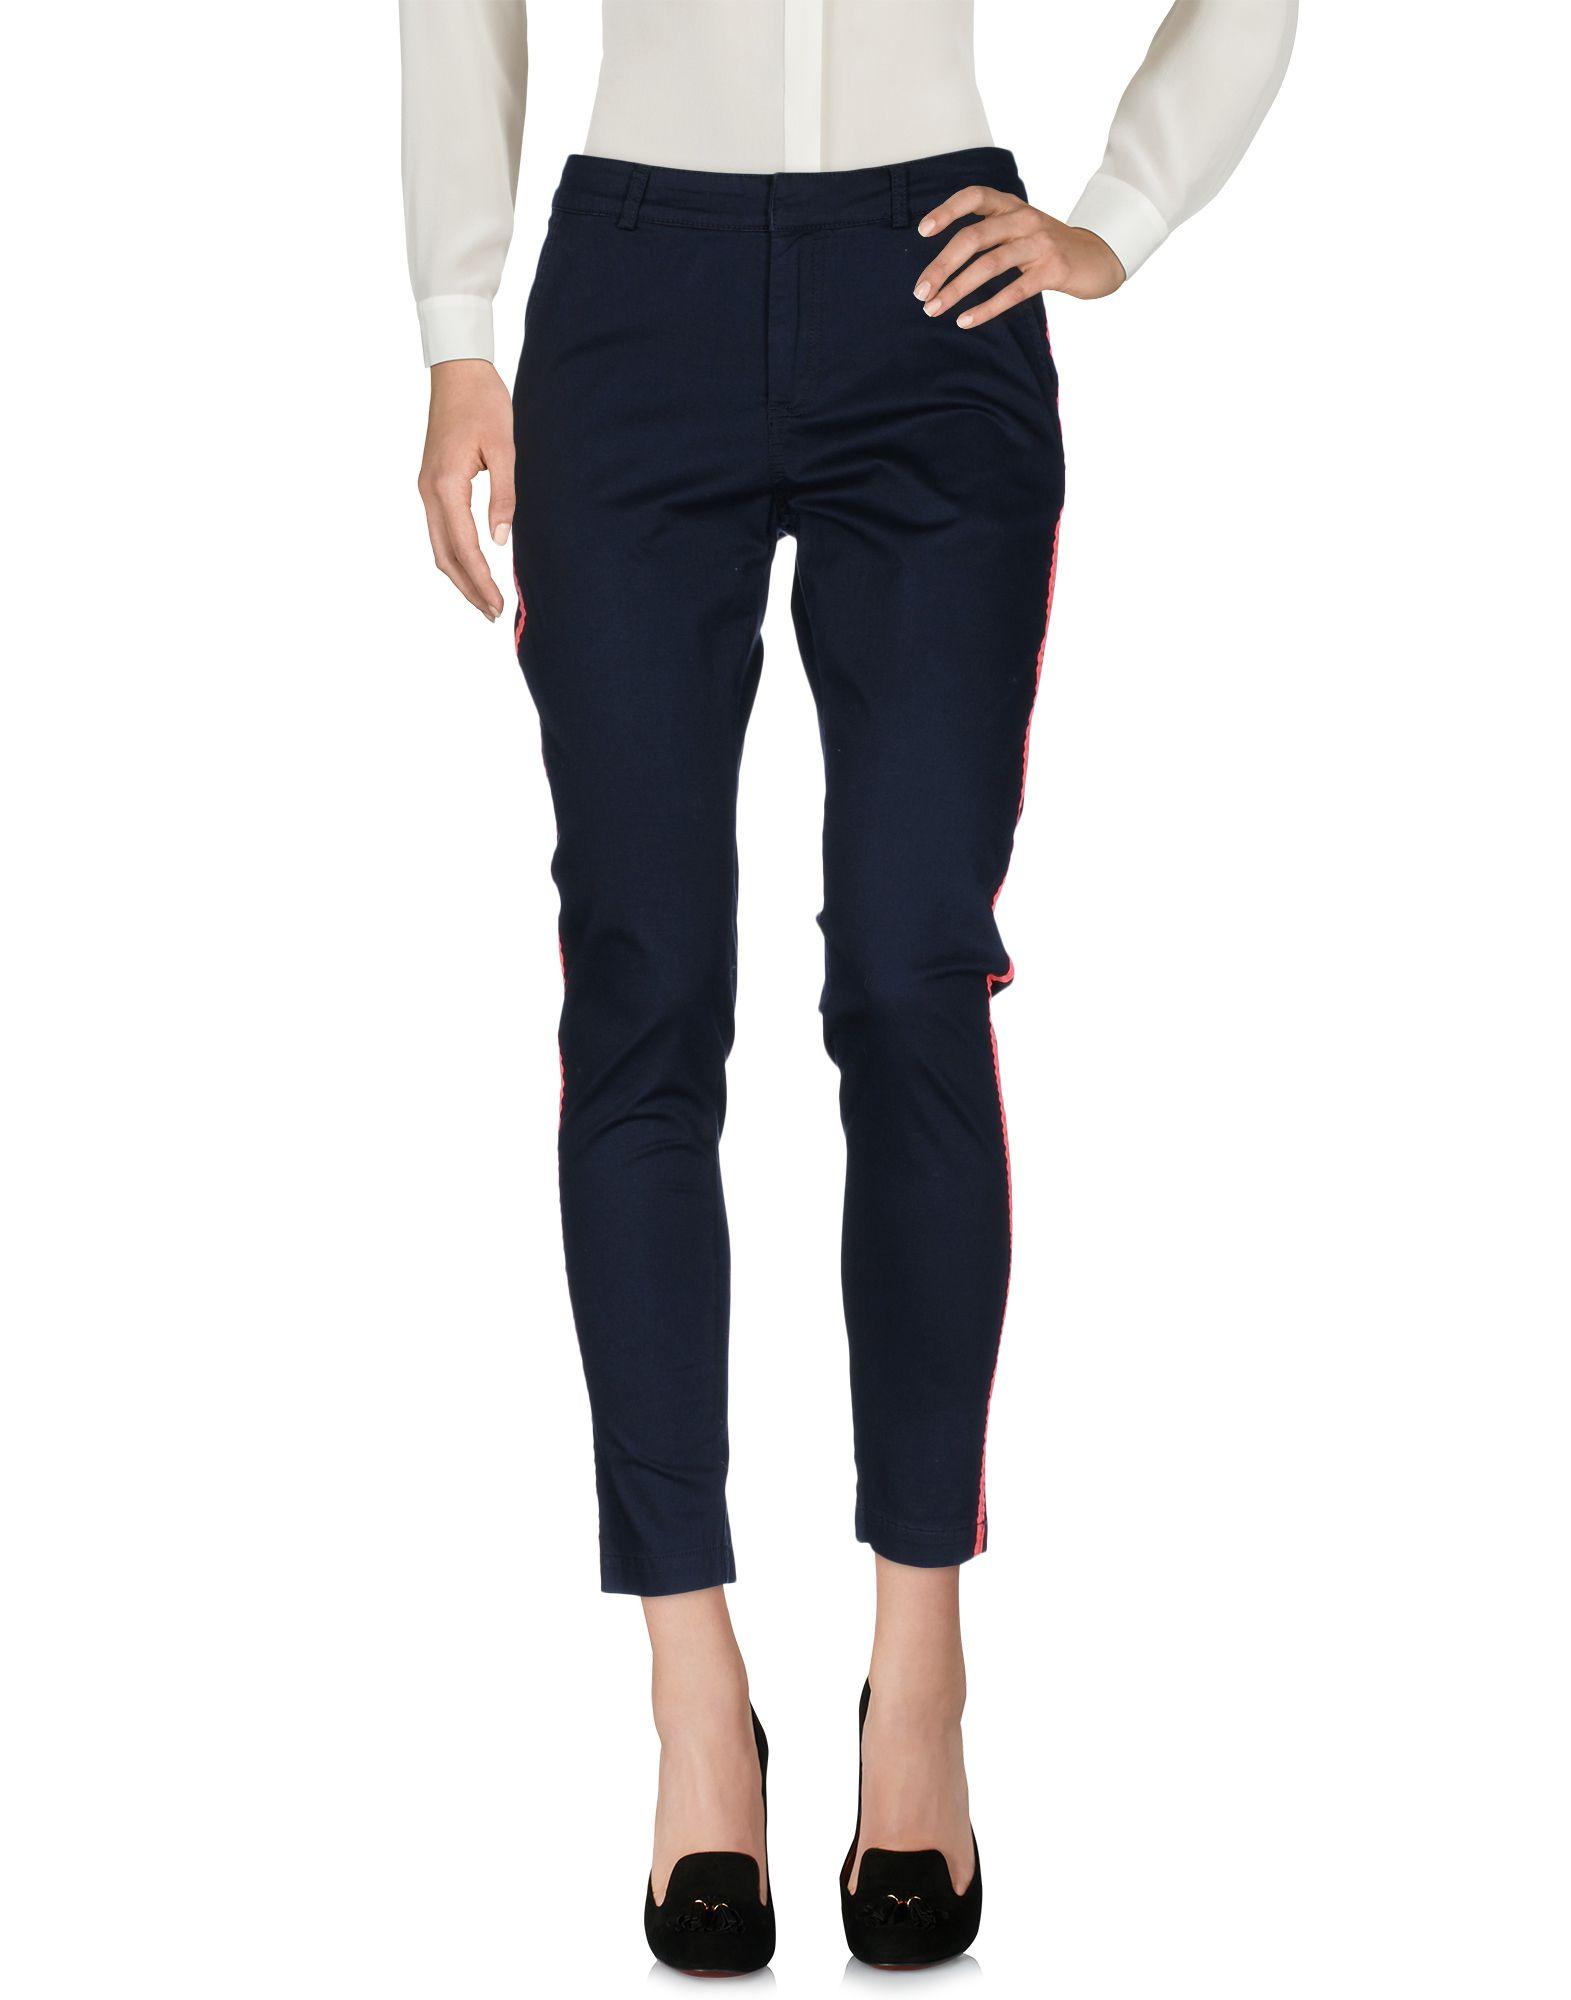 CUSTOMMADE Casual Pants in Dark Blue